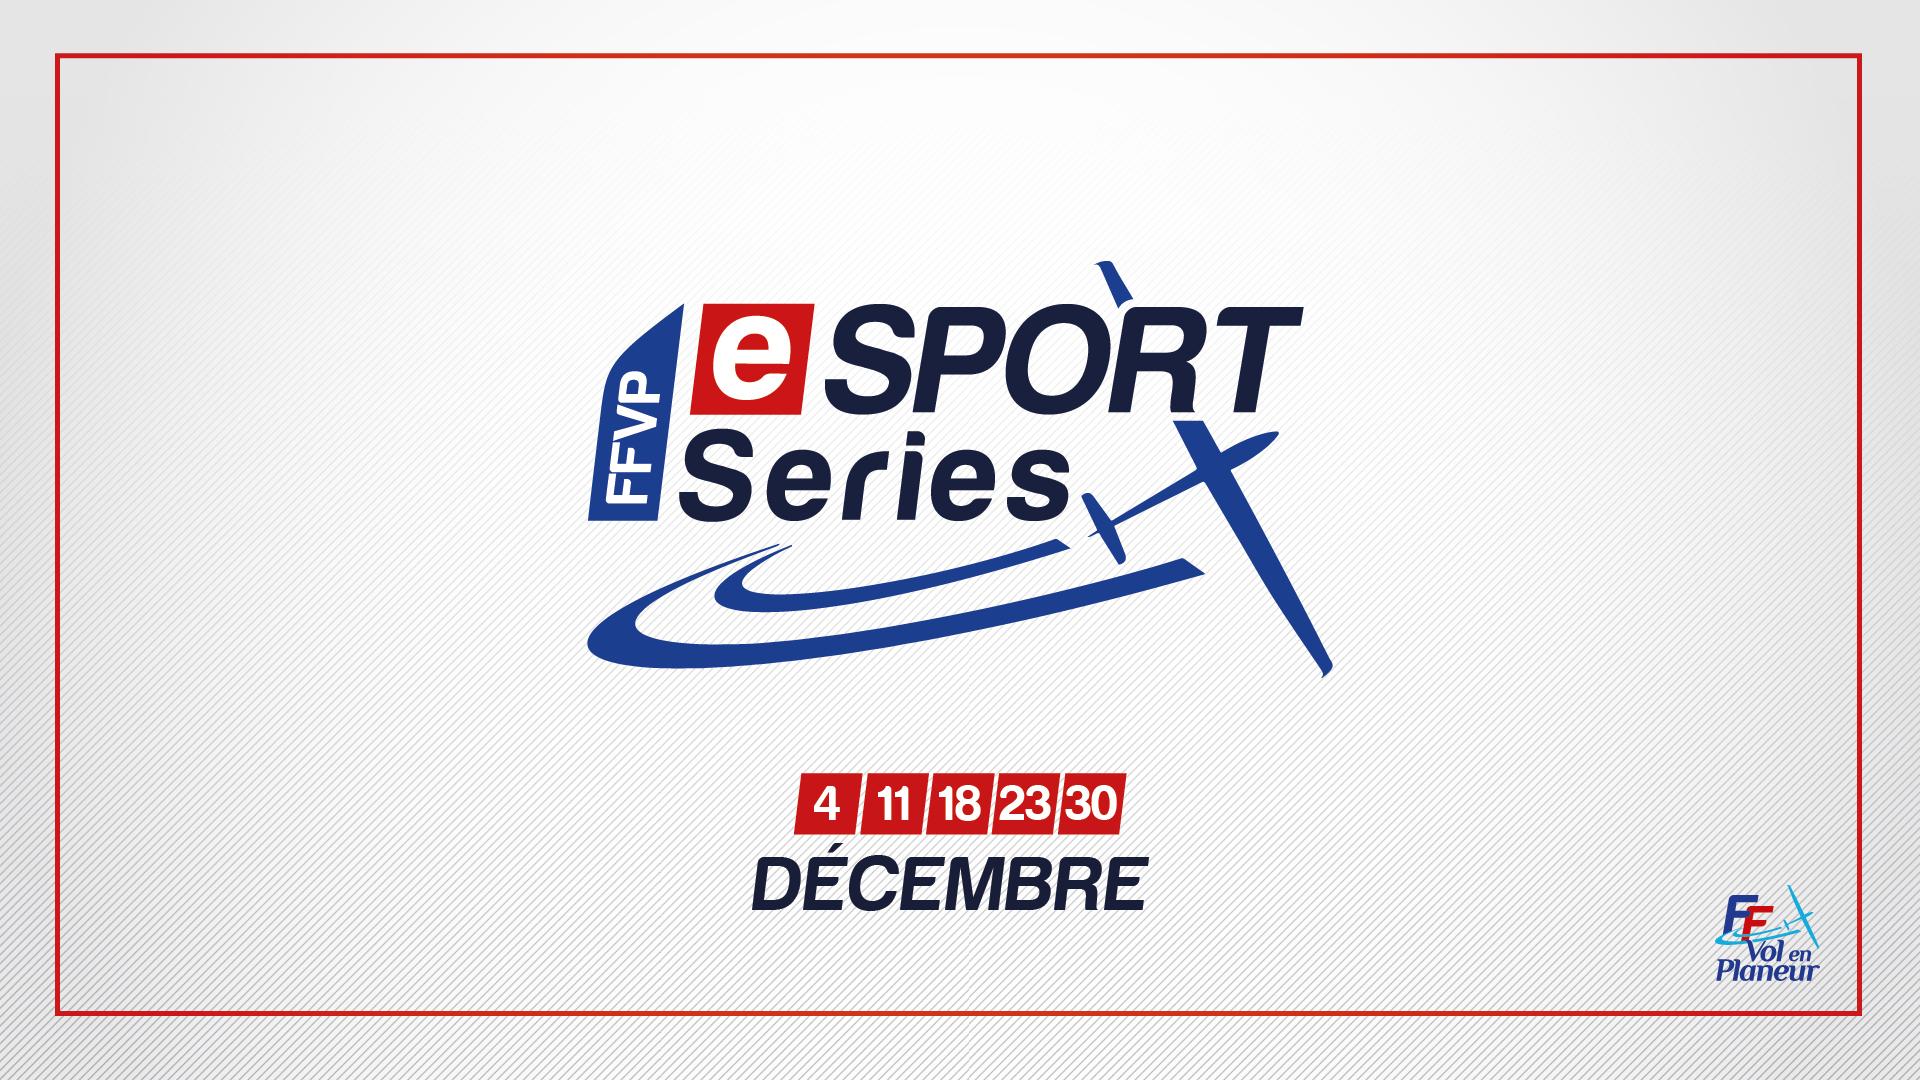 EsportSeries-Decembre2020-1920x1080-V1